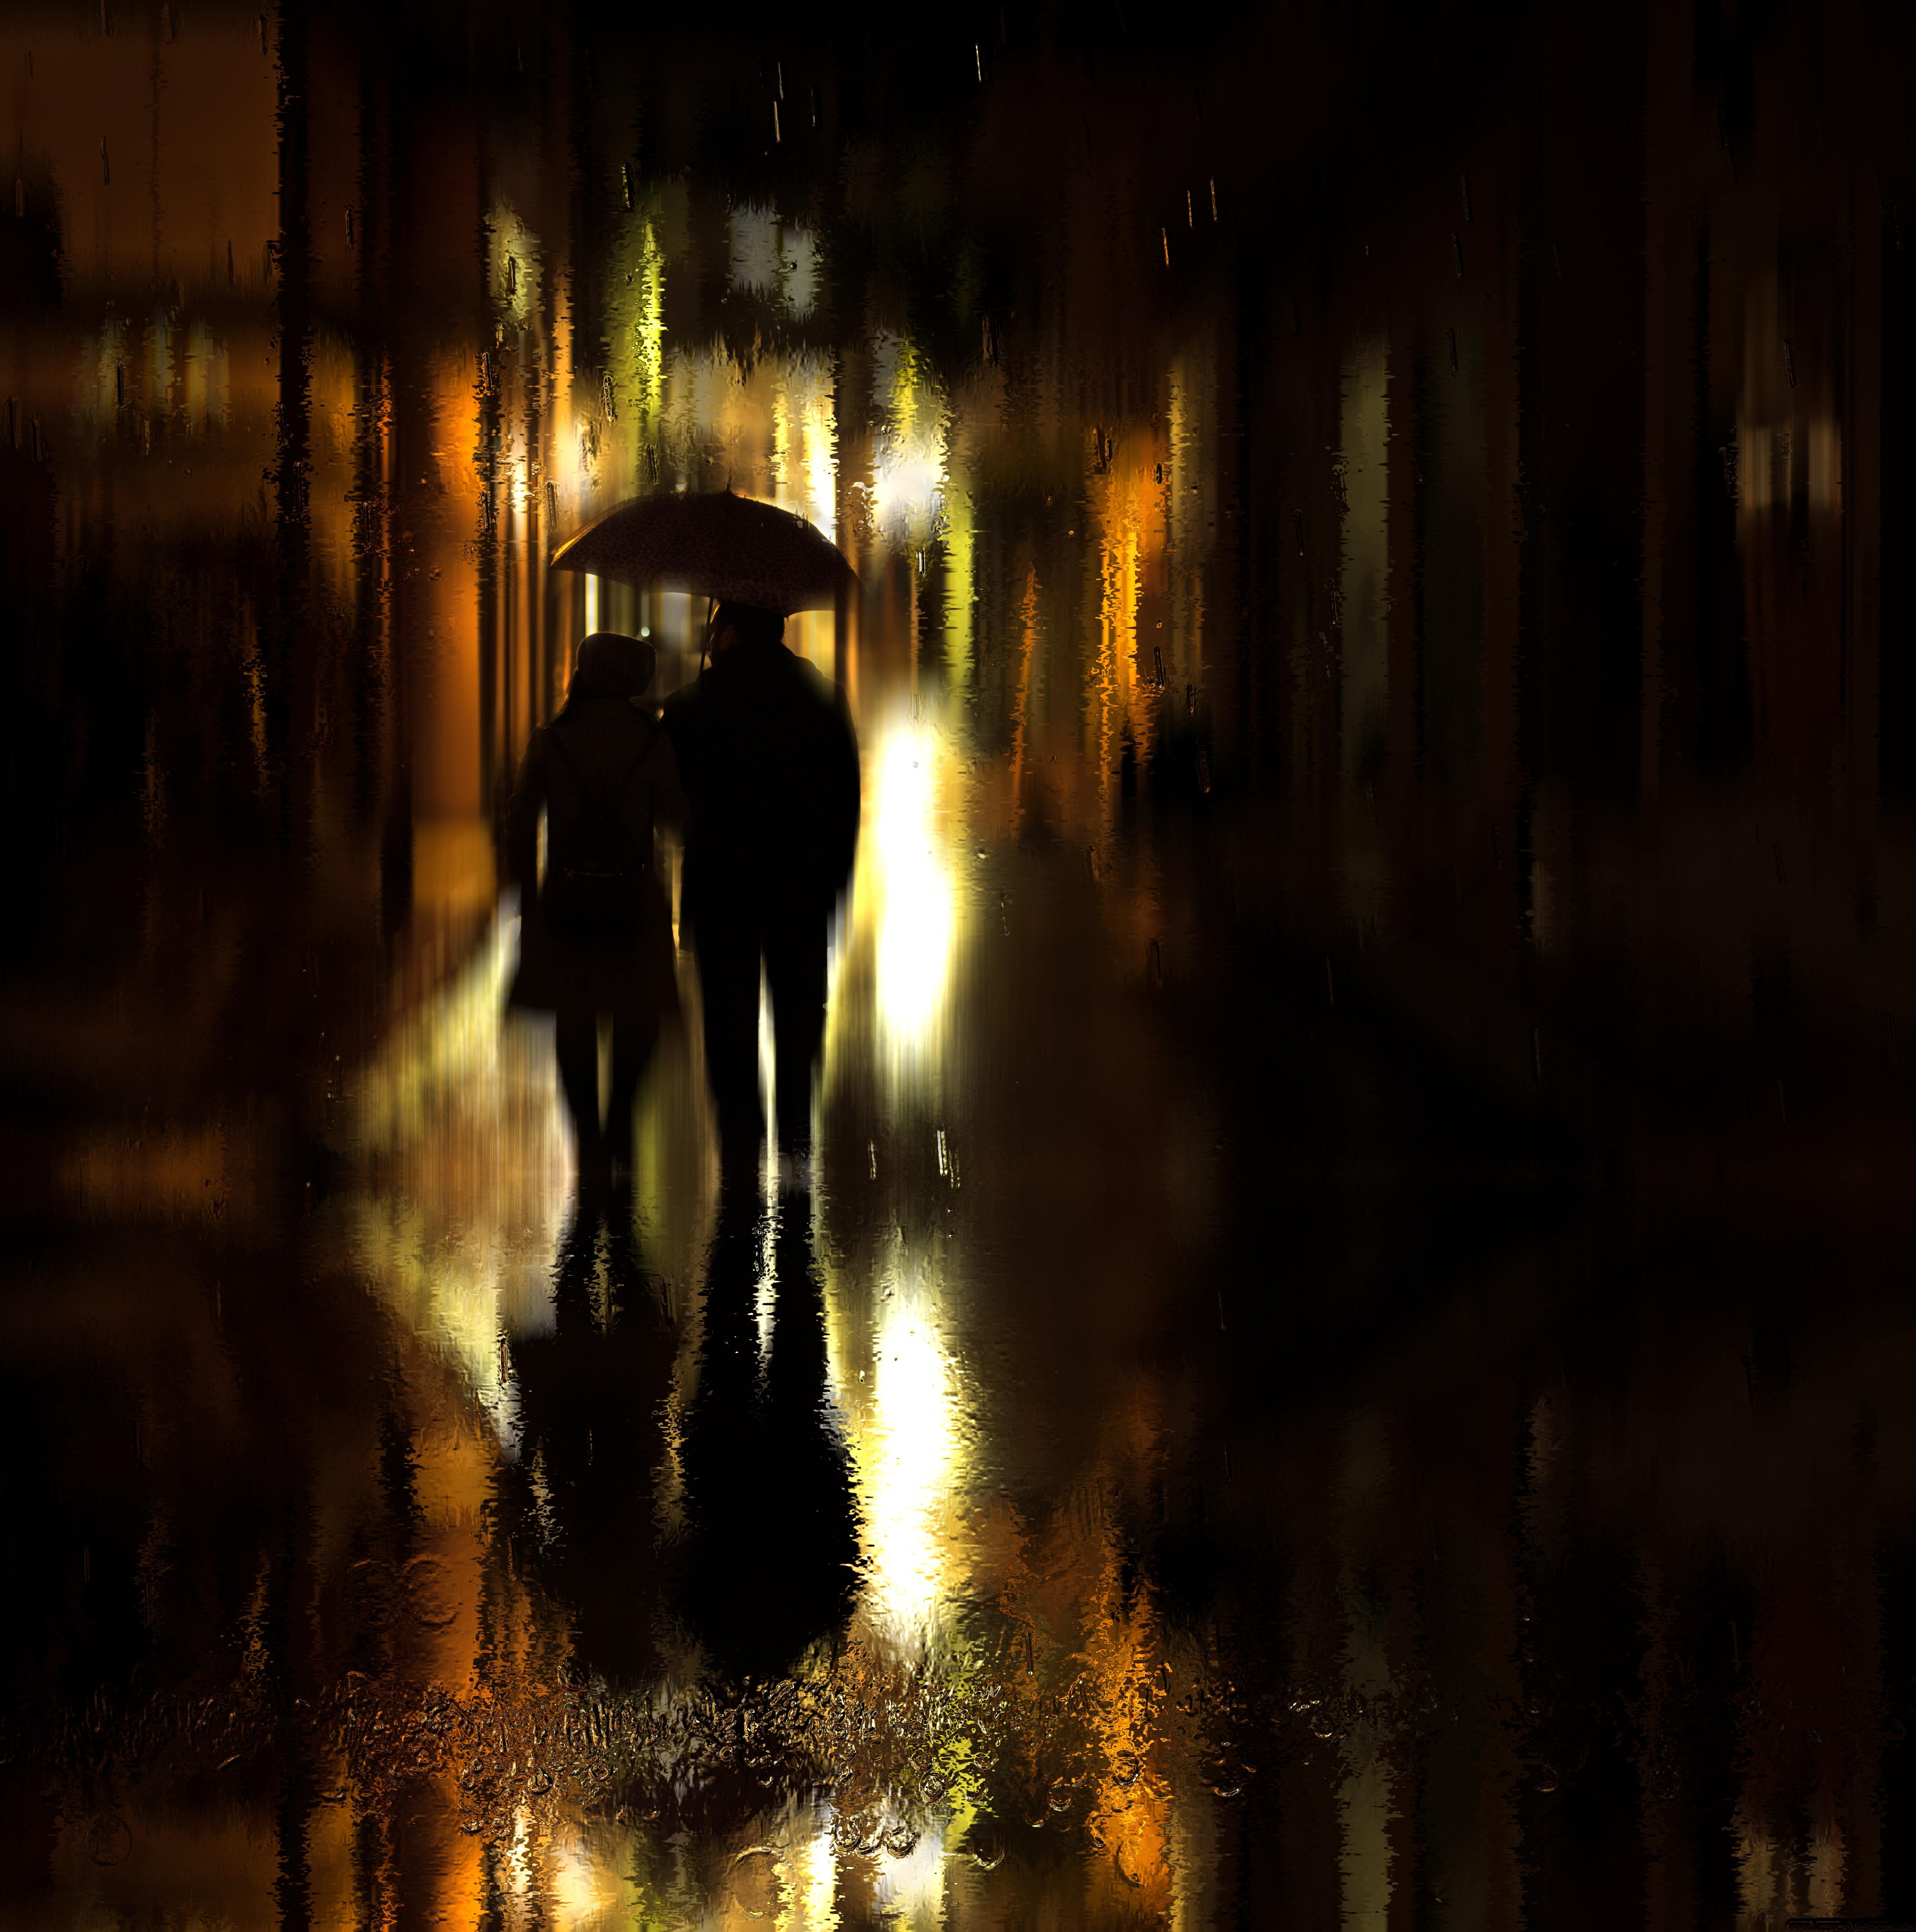 blur-blurred-background-blurry-1816529